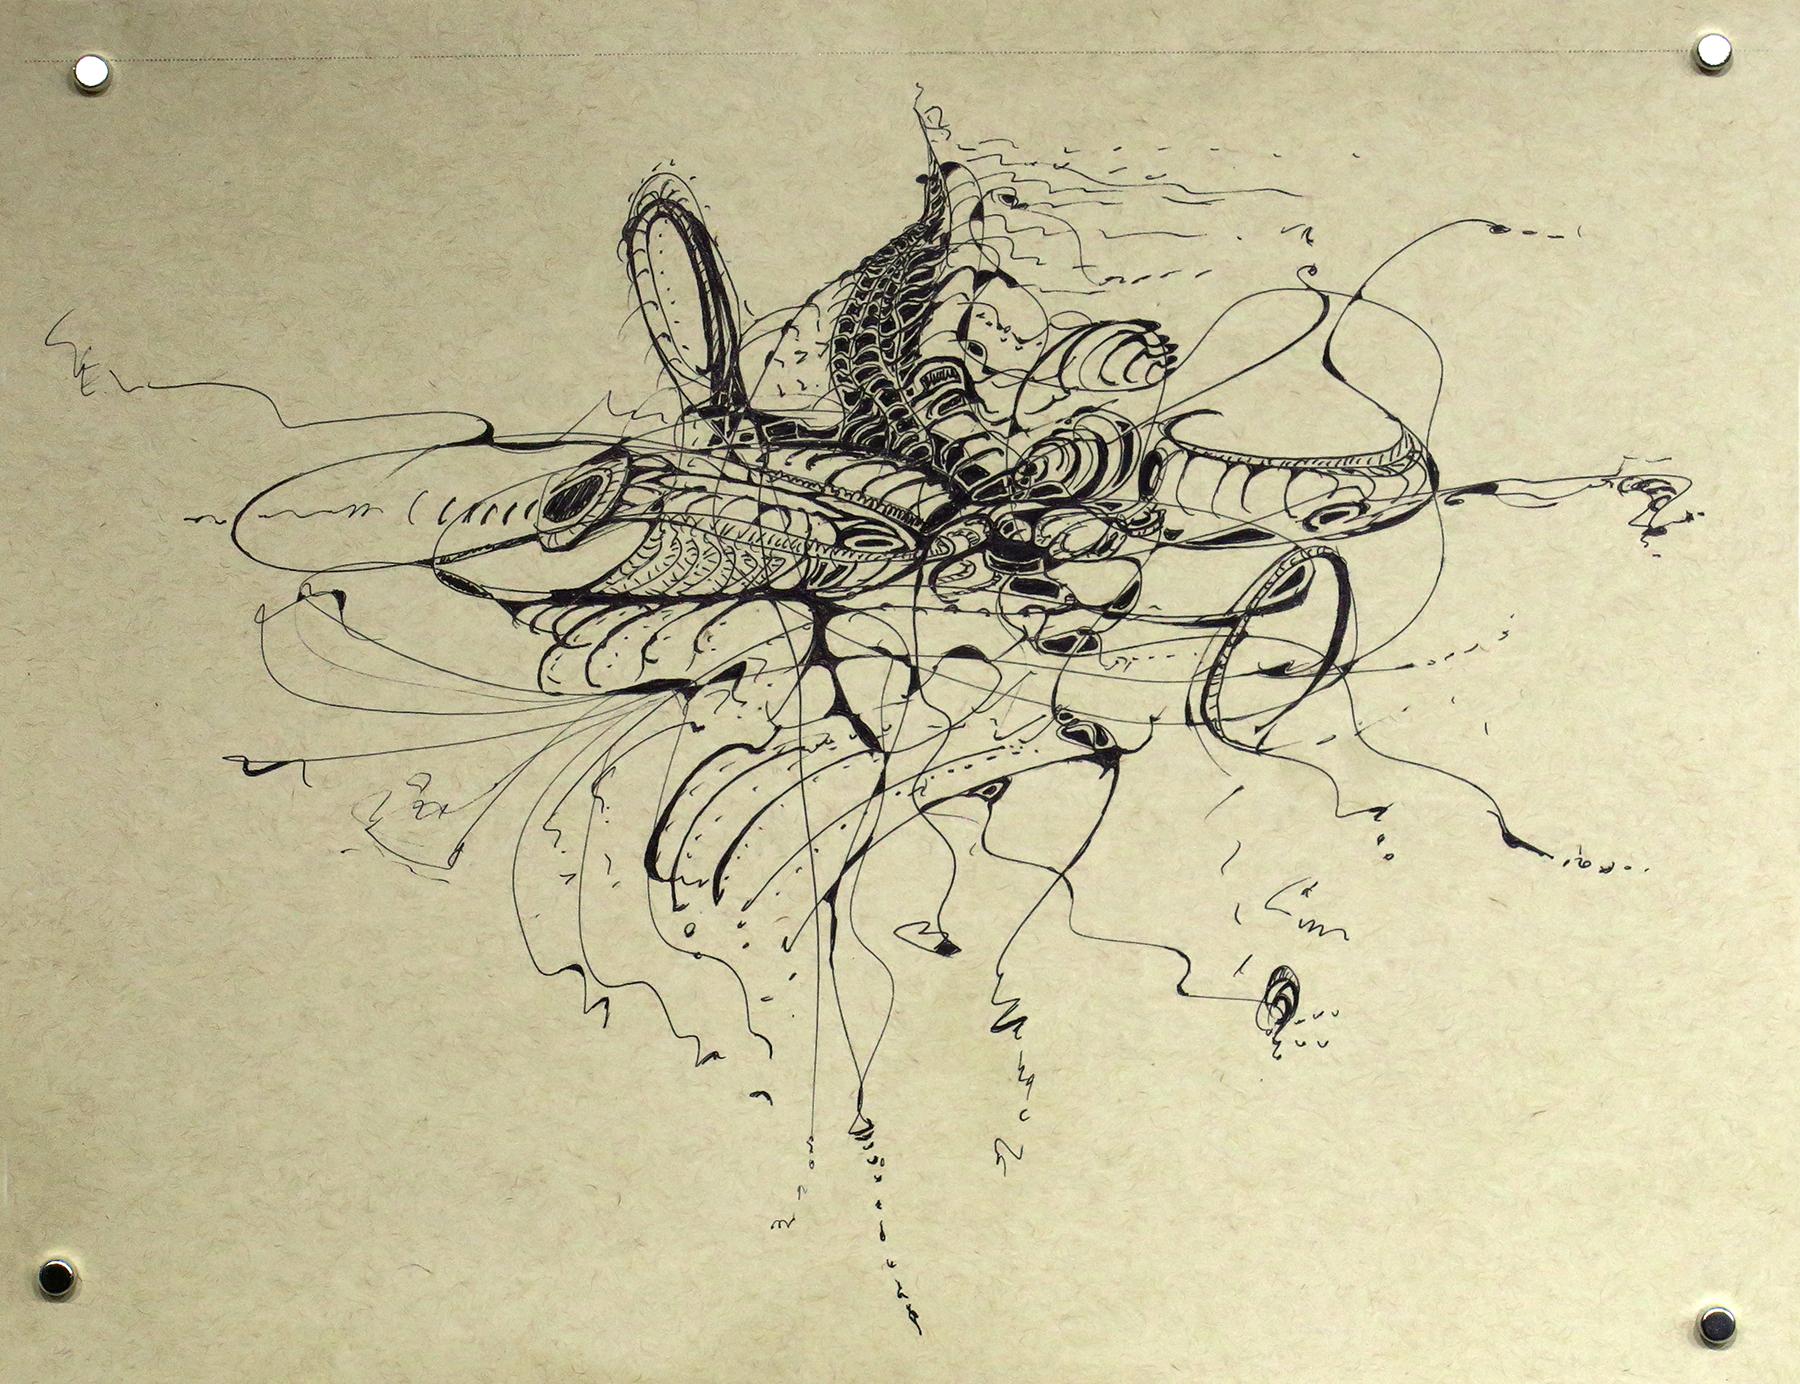 Kathryn Hart, Daunting Transitions, Krakow, Ink Drawing 6